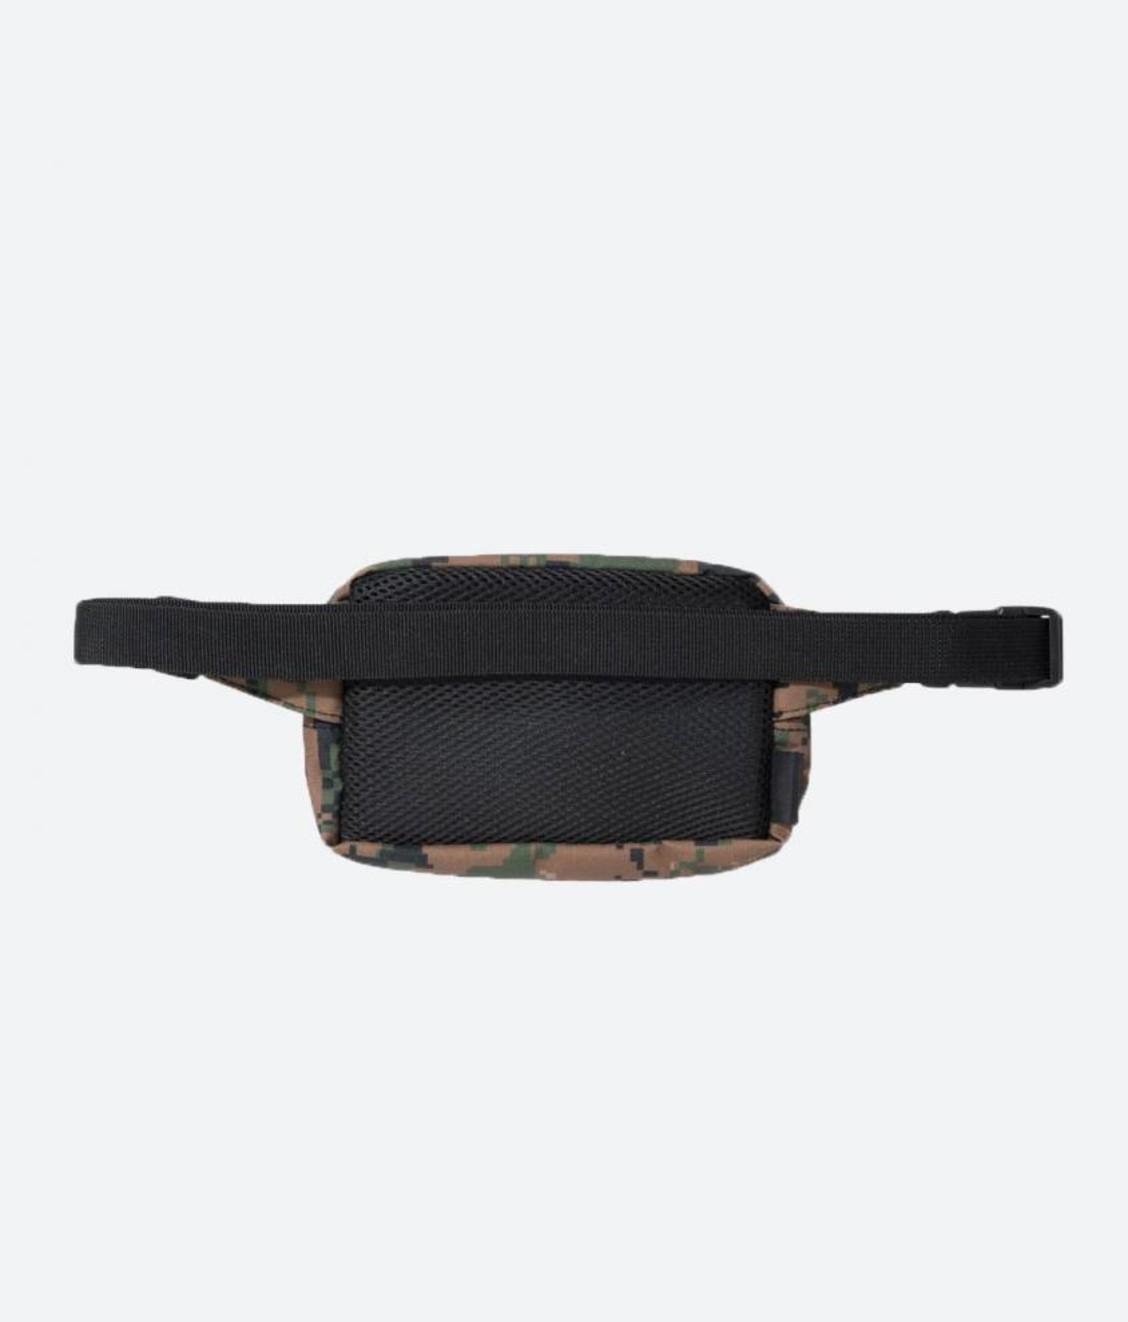 Stussy Stussy Digi Camo Waist Bag